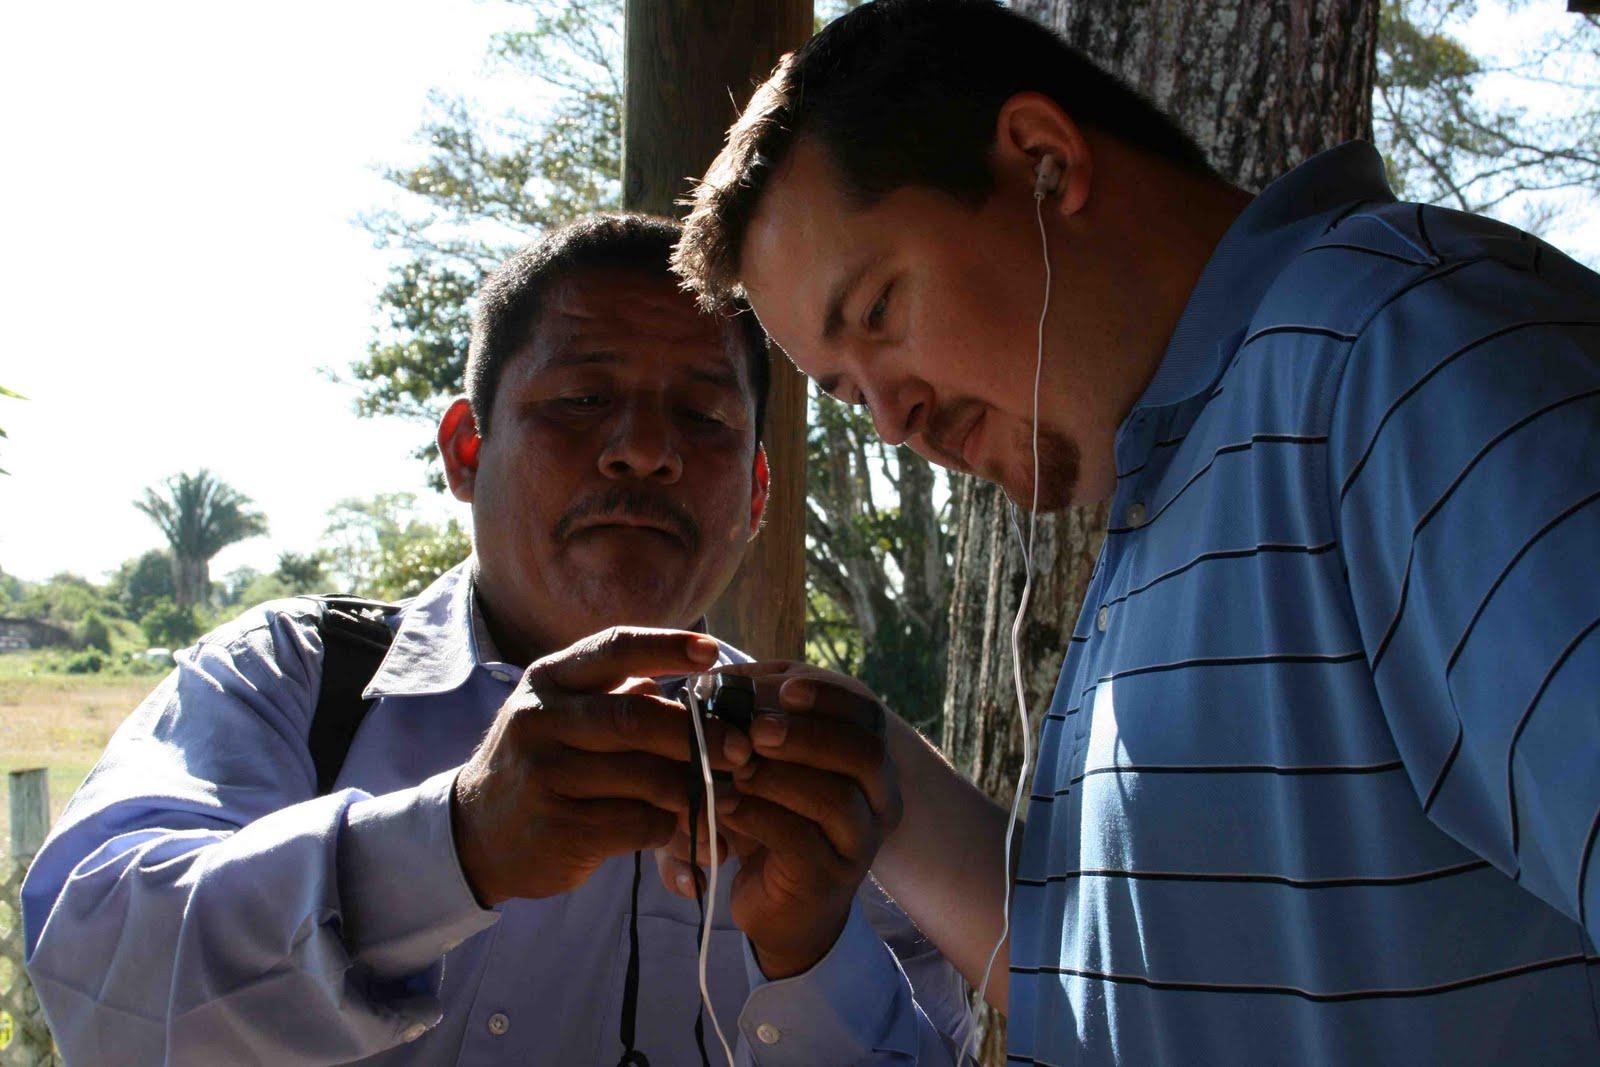 Livin' Our Dreams: The Kekchi Radio Ministry in Petén